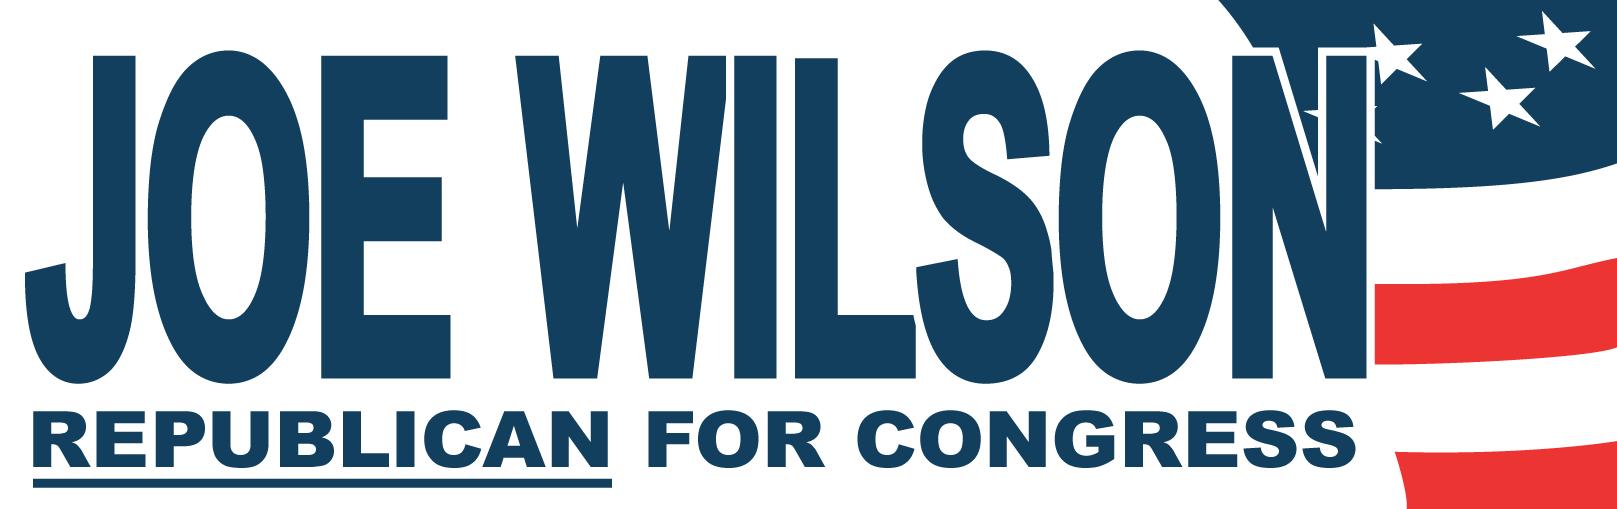 Wilson logo inverse